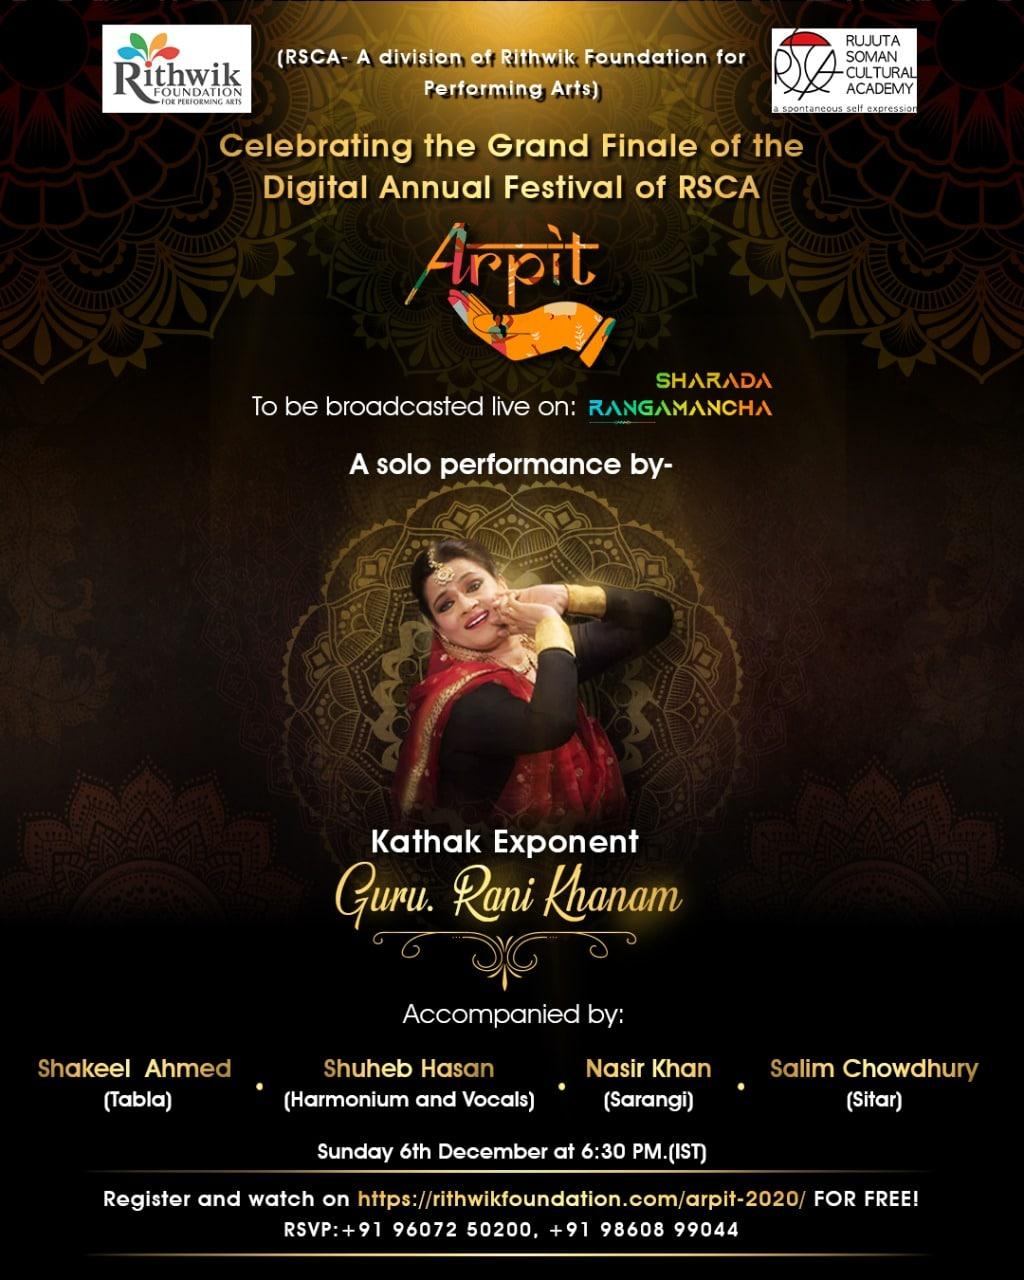 Rani Khanam Updated Poster